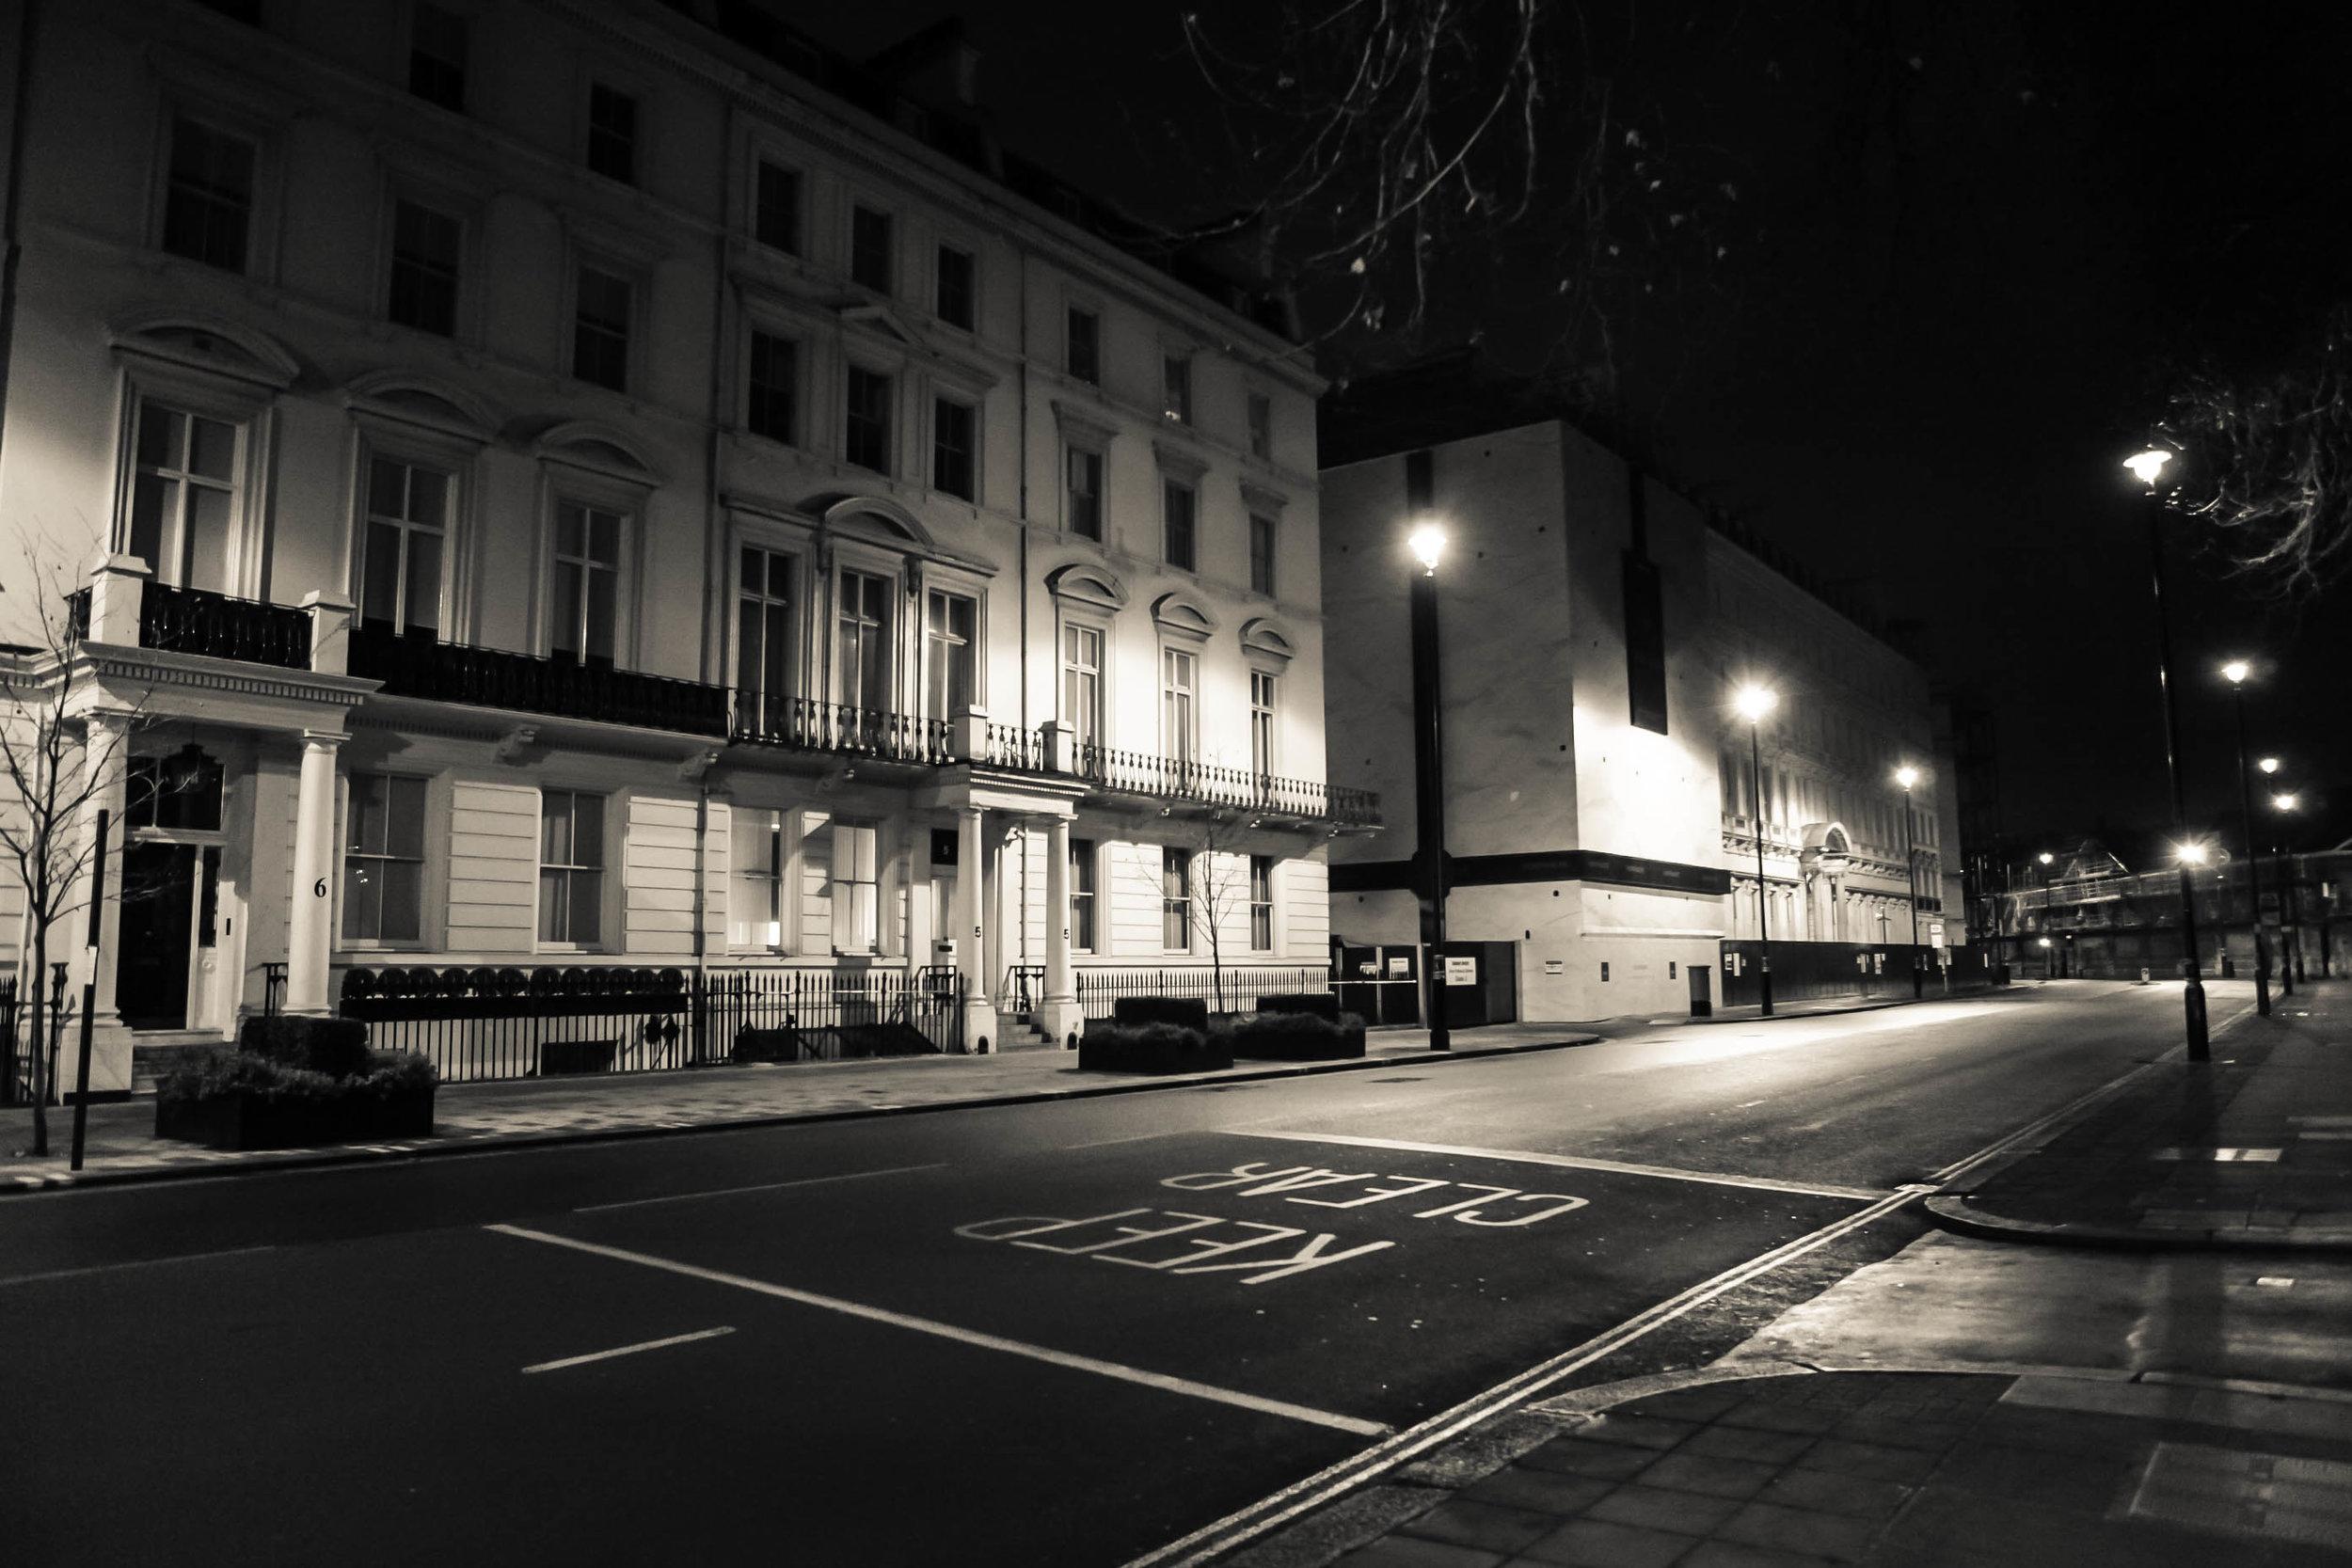 london-night-scence.jpg